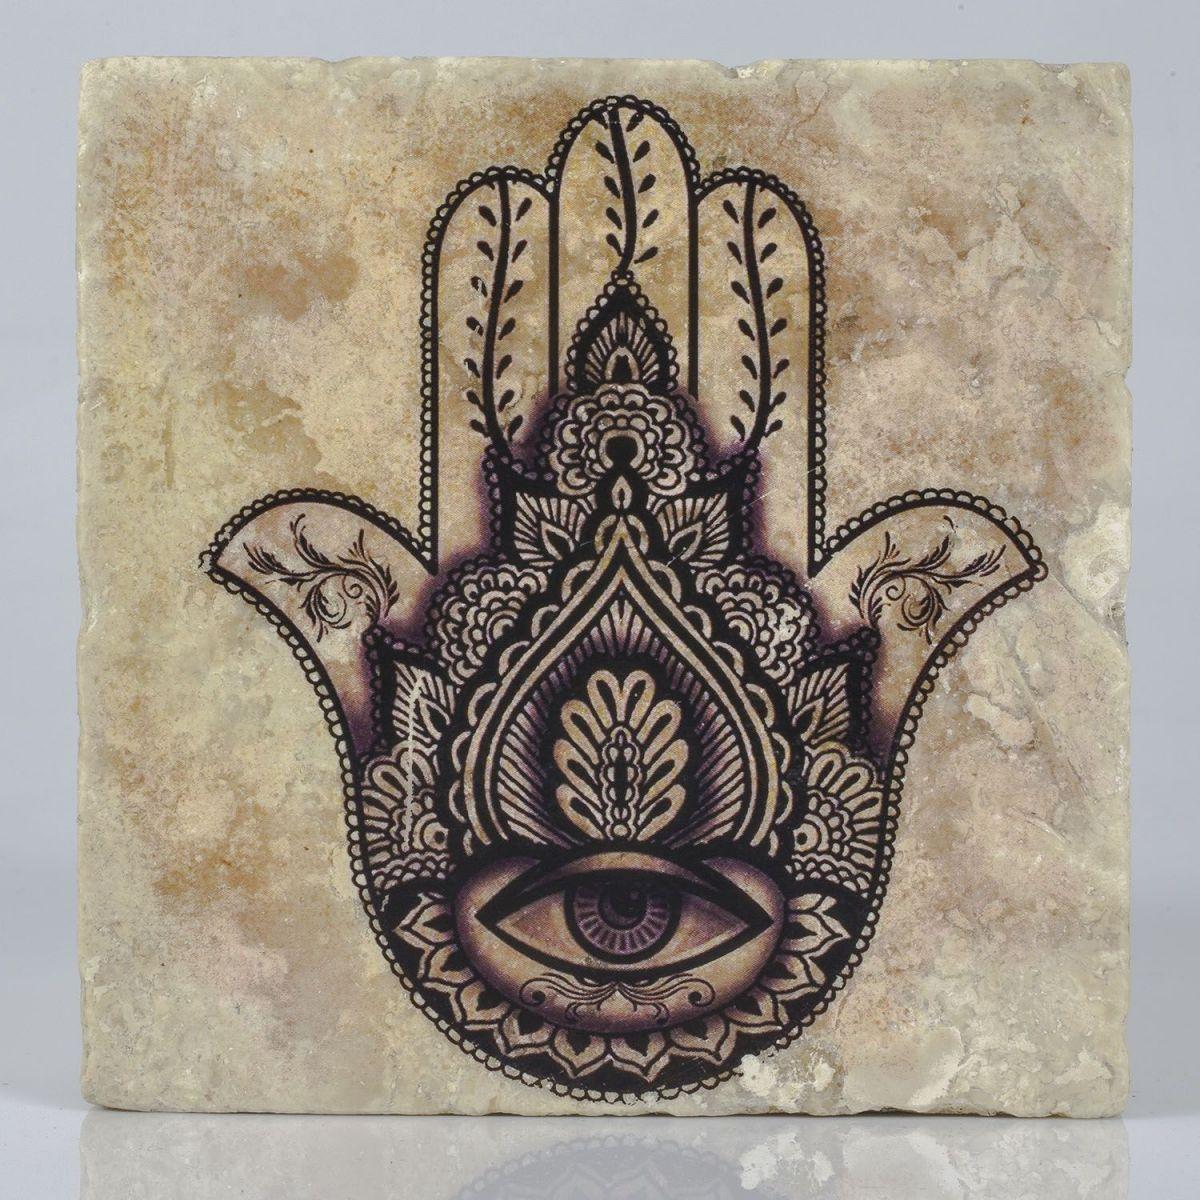 Coaster Travertine - Hand Of Fatima / Black 5 - (10x10)